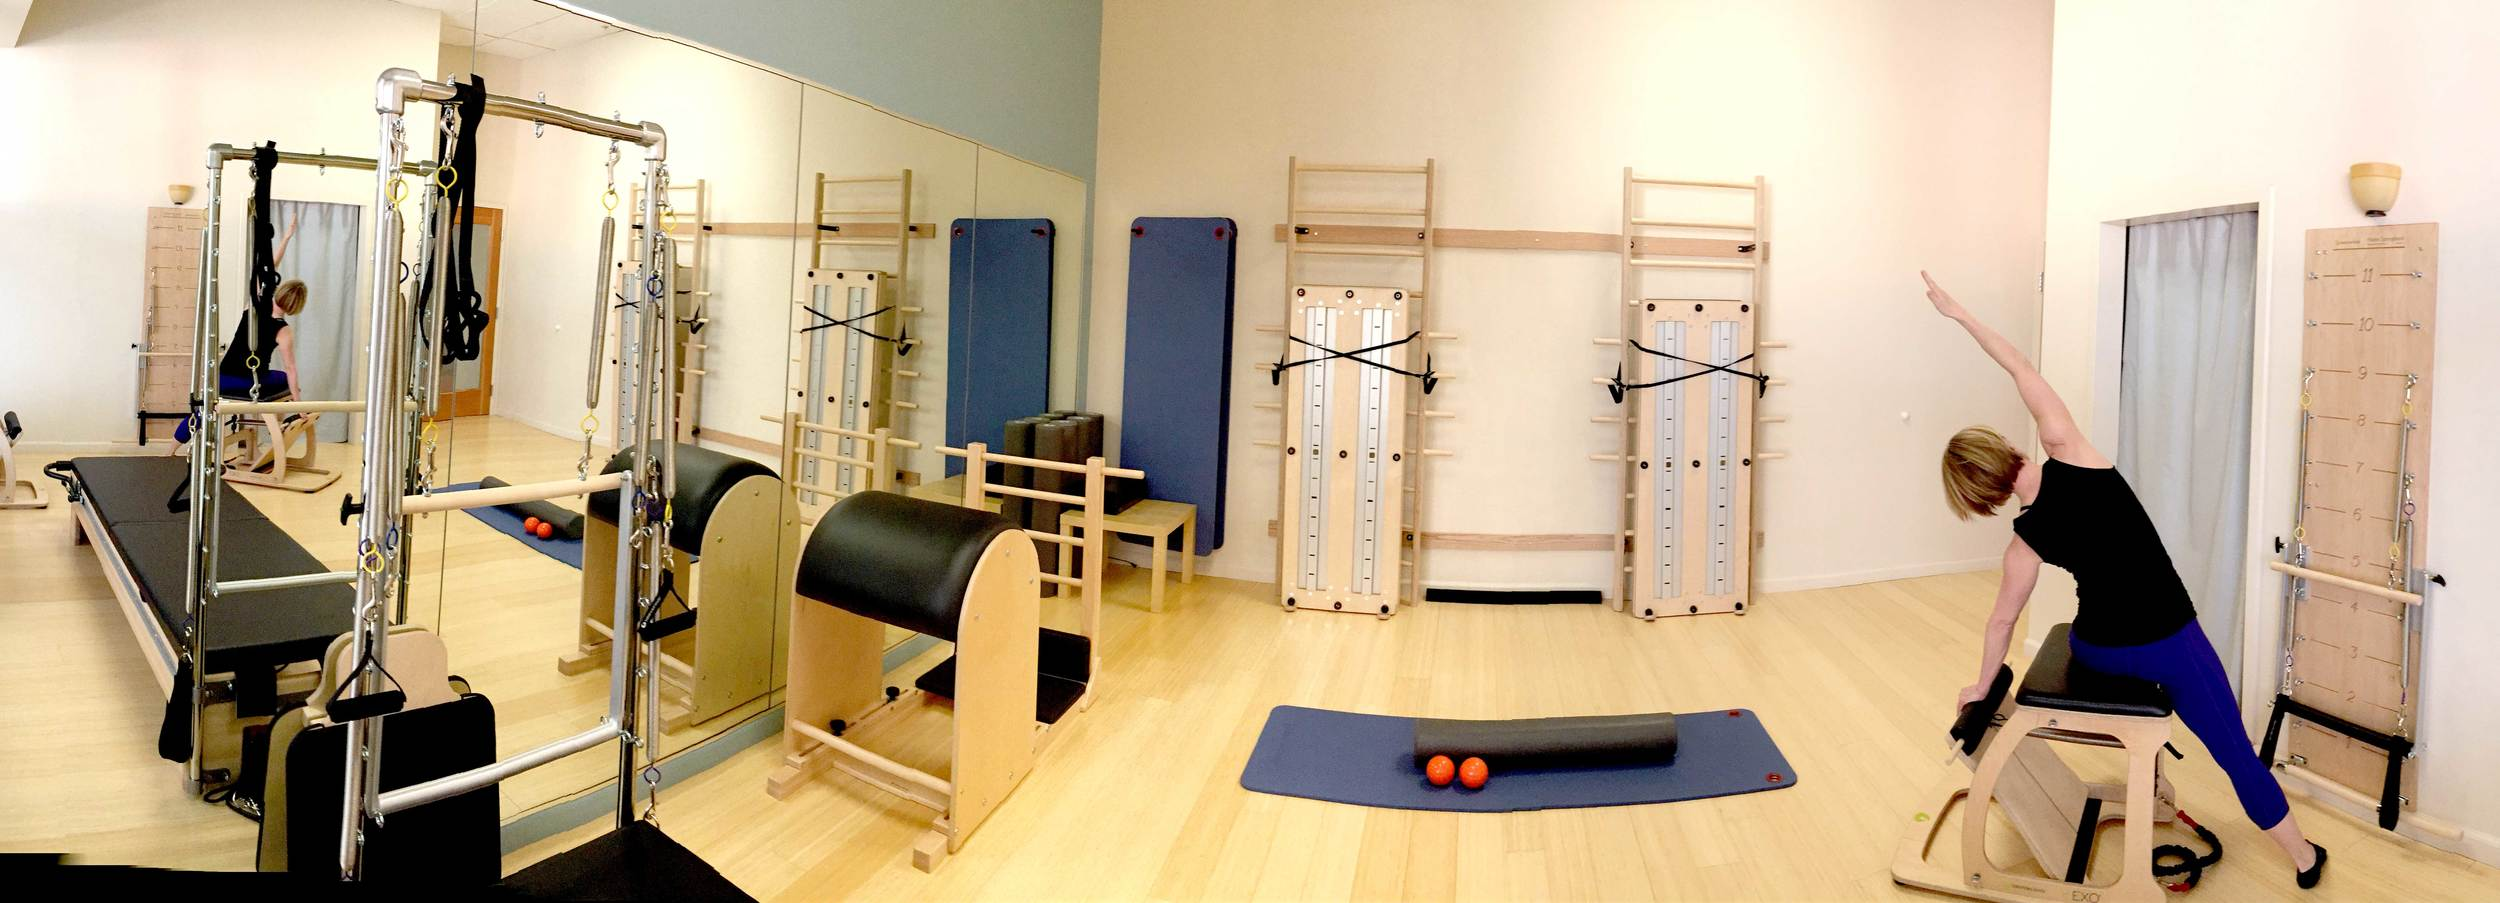 Move Beyond Pilates Studio in Cupertino, CA